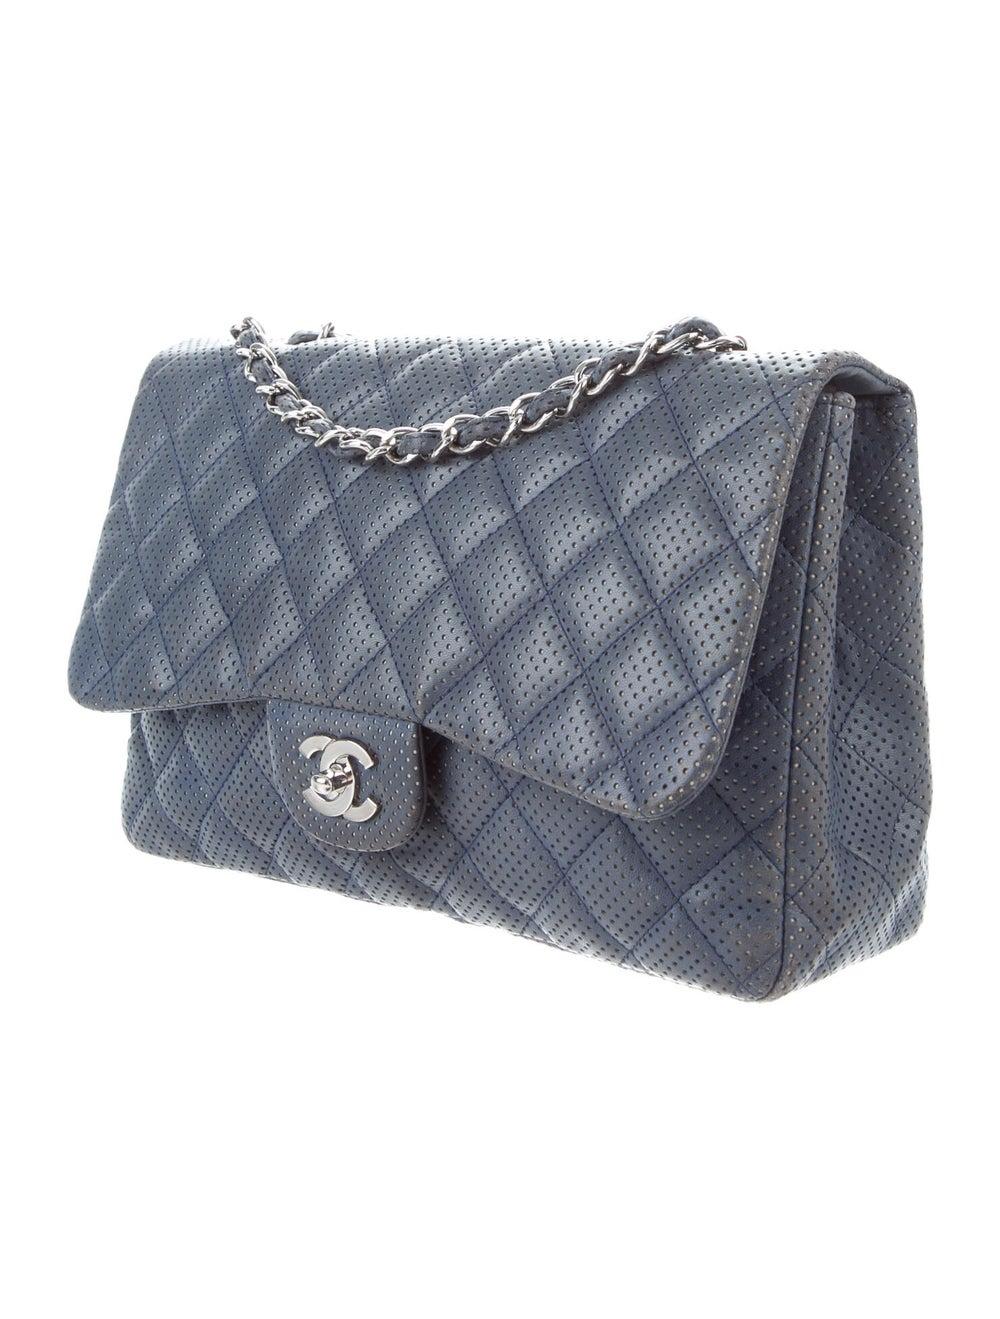 Chanel Perforated Classic Jumbo Single Flap Bag B… - image 3